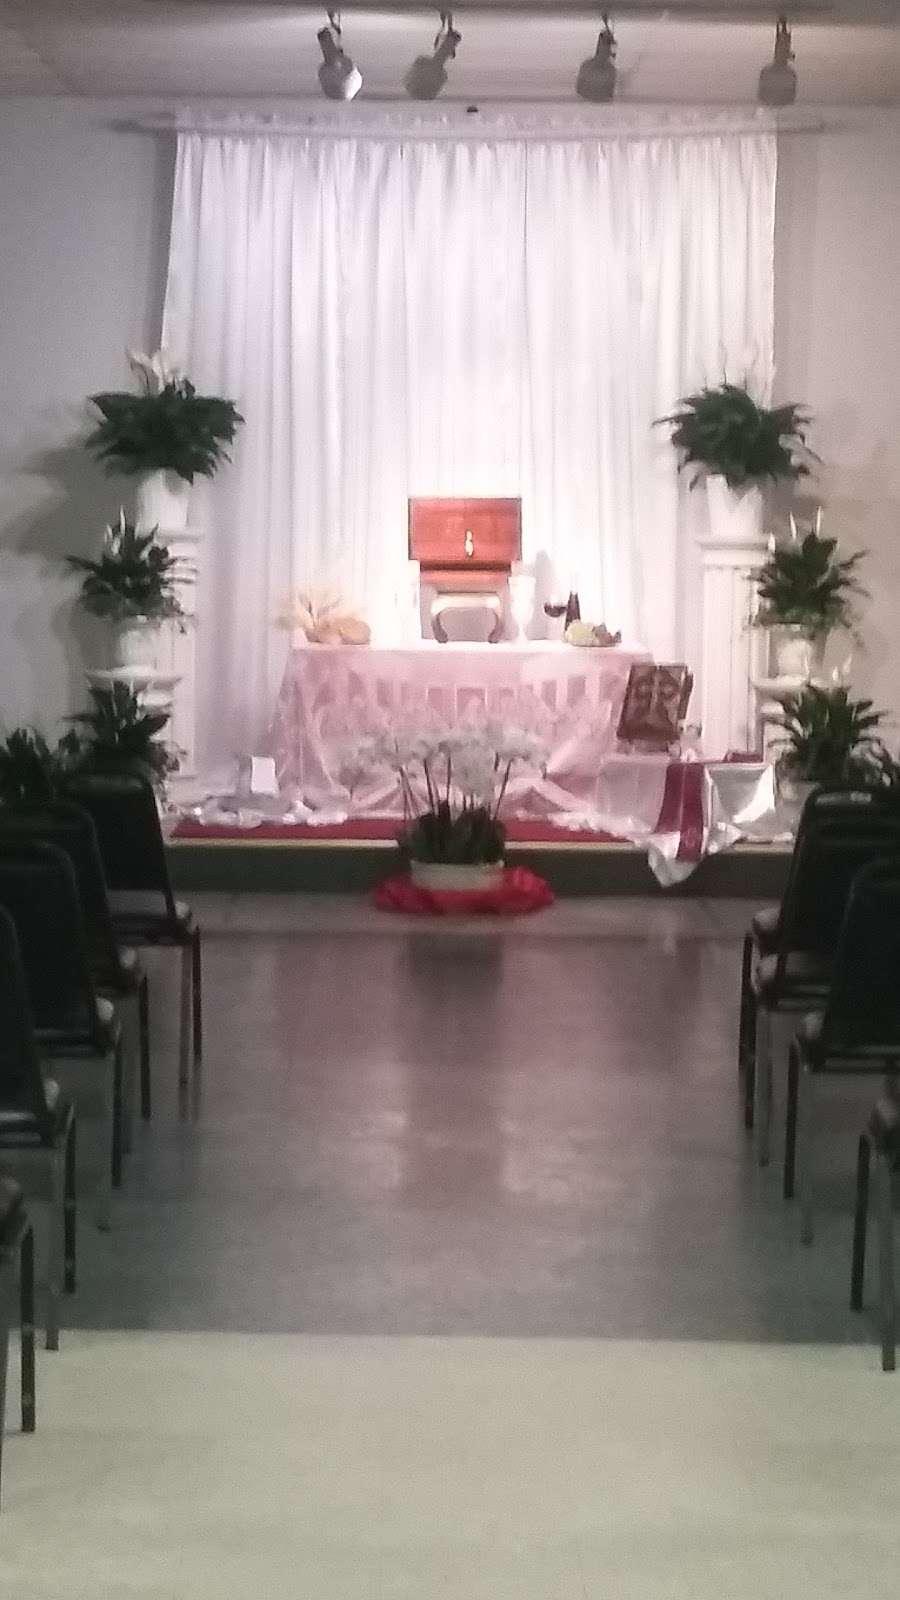 St. Francis of Assisi Catholic Church - church    Photo 8 of 10   Address: 834 S Orange Blossom Trail, Apopka, FL 32703, USA   Phone: (407) 886-4602